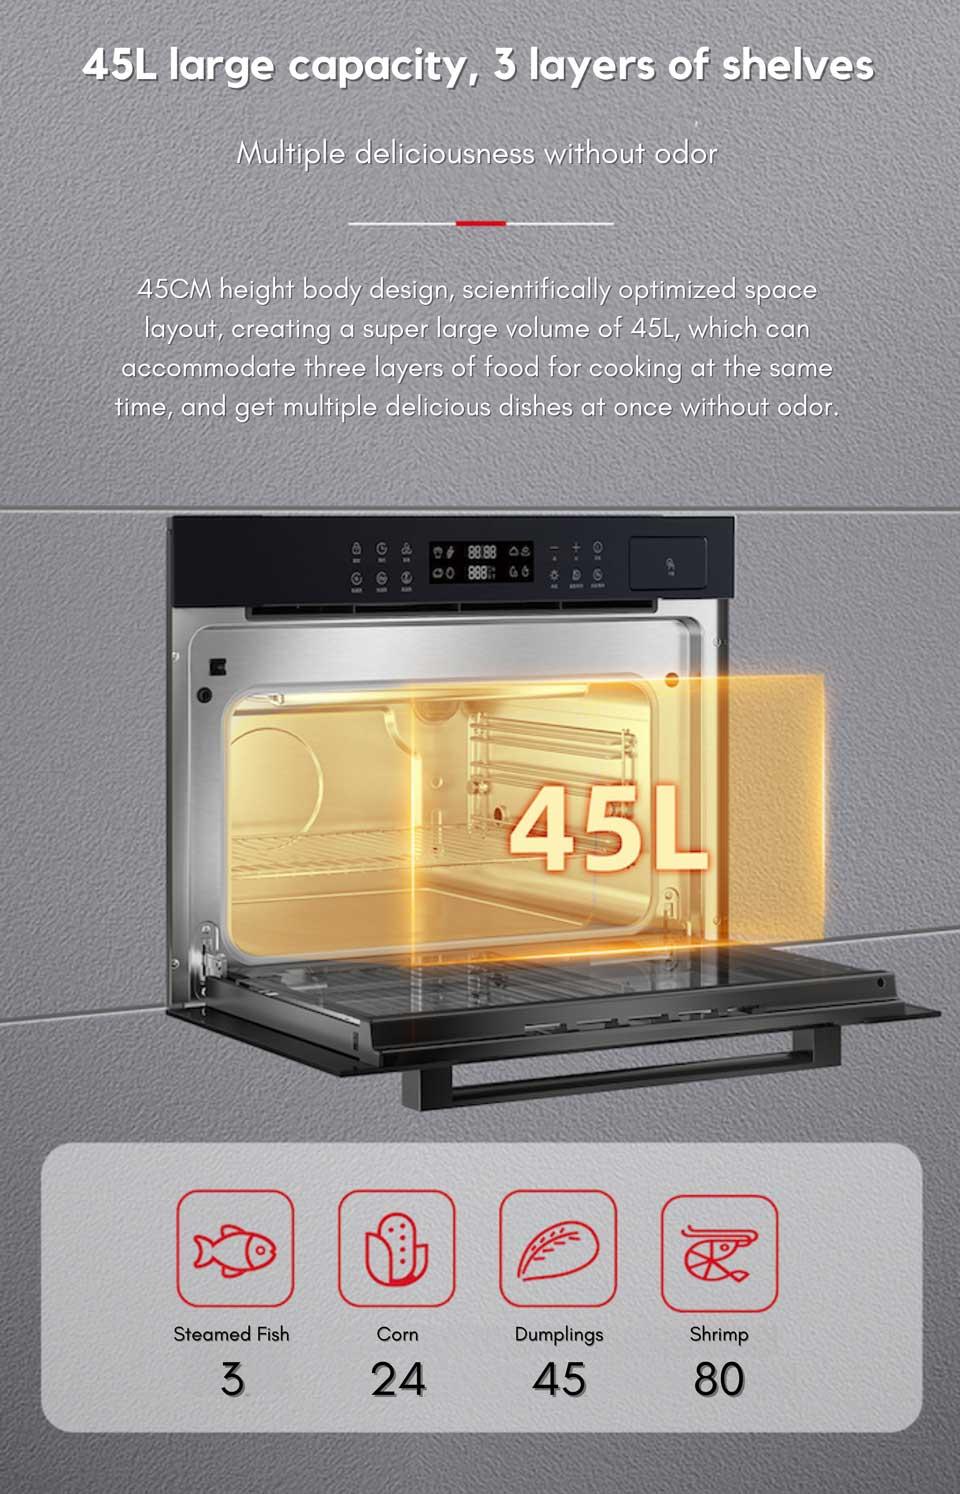 45cm series DE&E ZA4565A built-in steam oven with 45 liter capacity